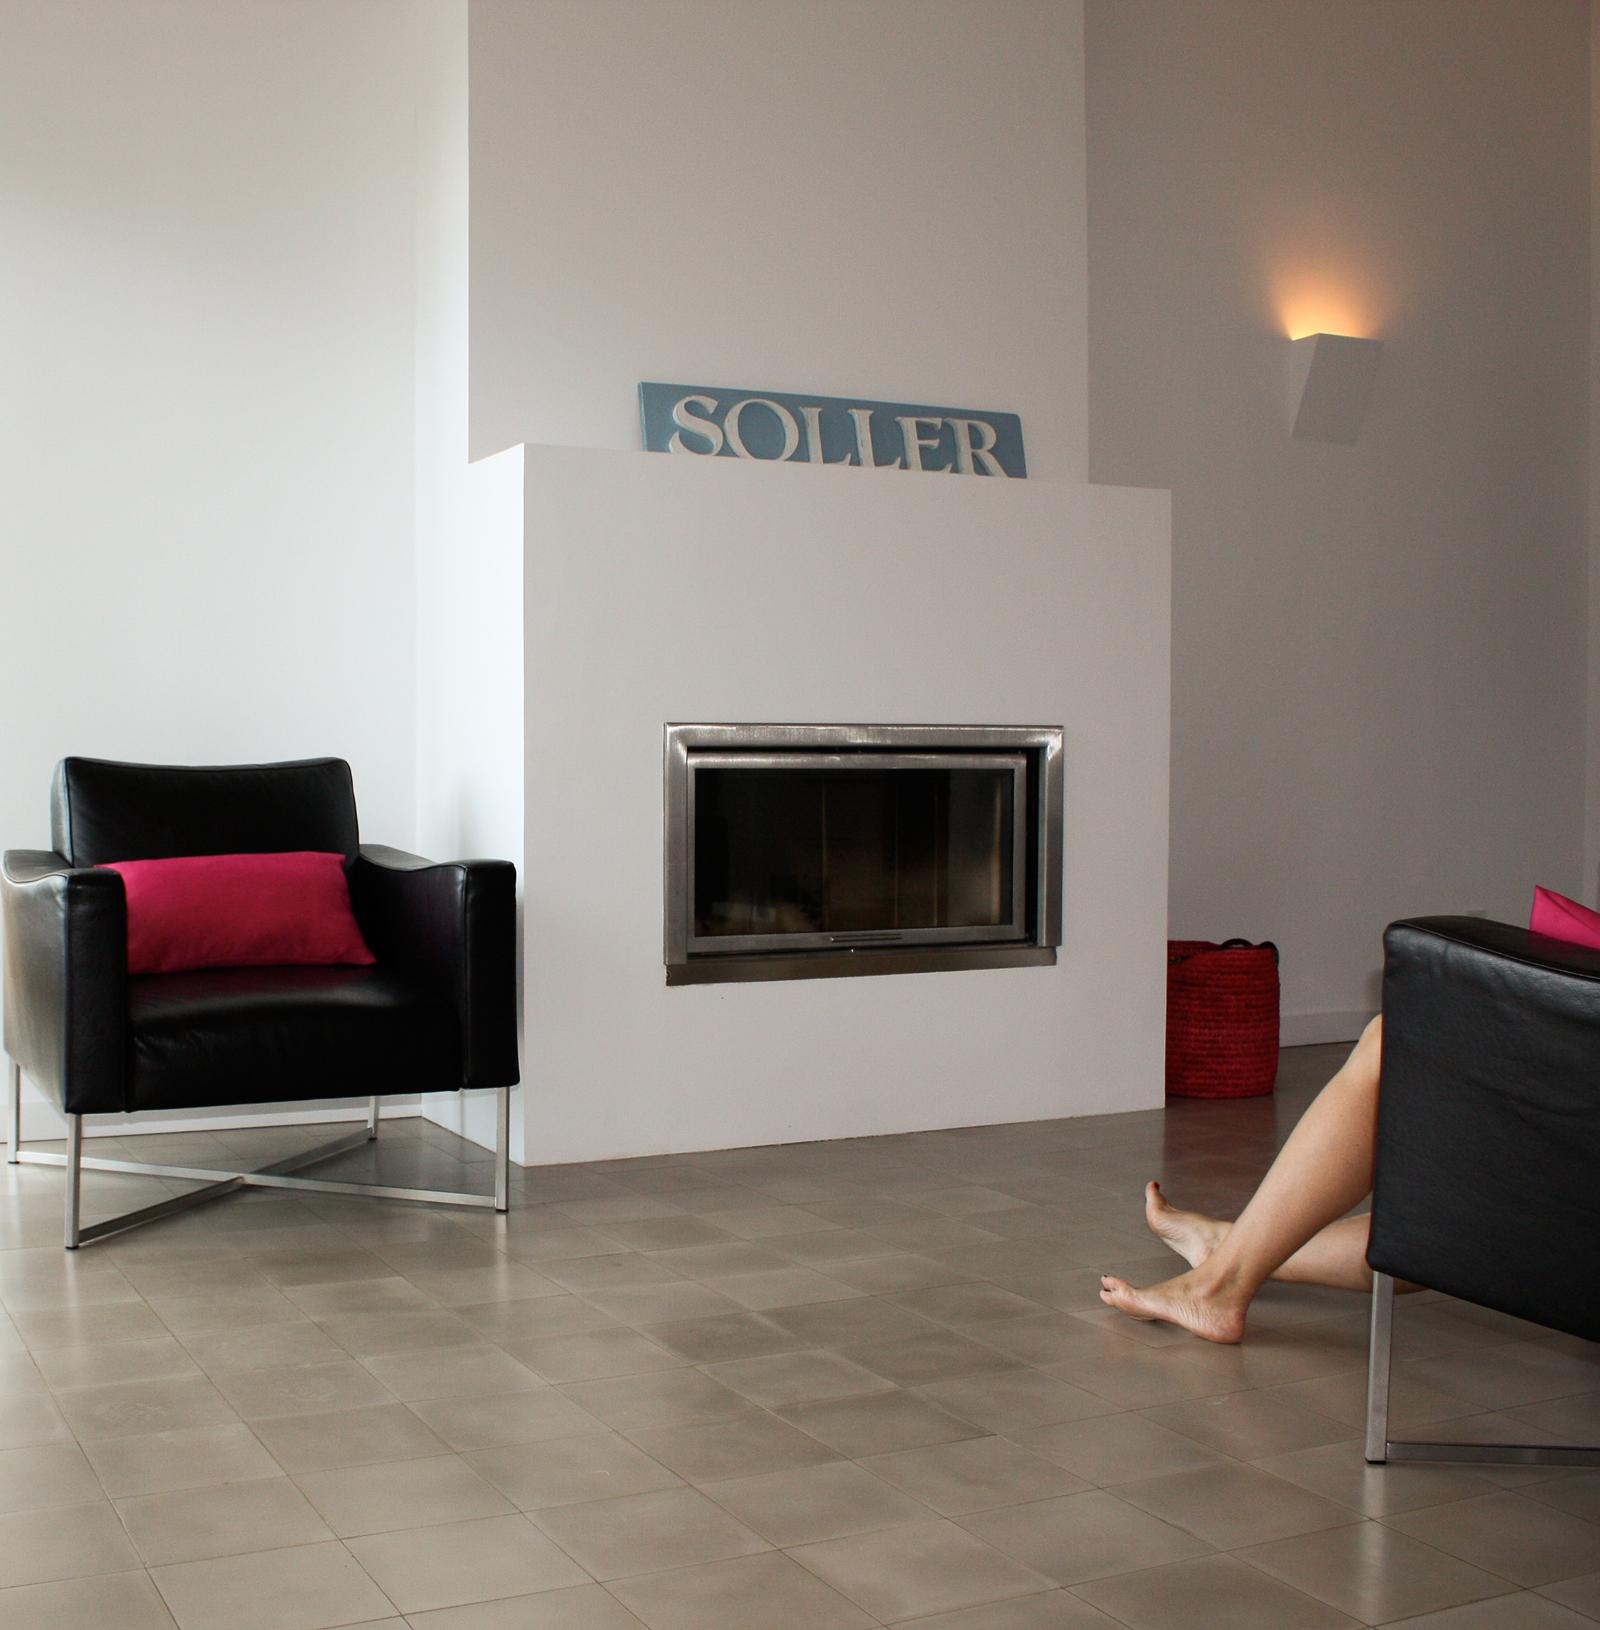 zementfliesen-terrazzofliesen-kreidefarbe-terrazzo-fugenlos-viaplatten-54-kamin | 54